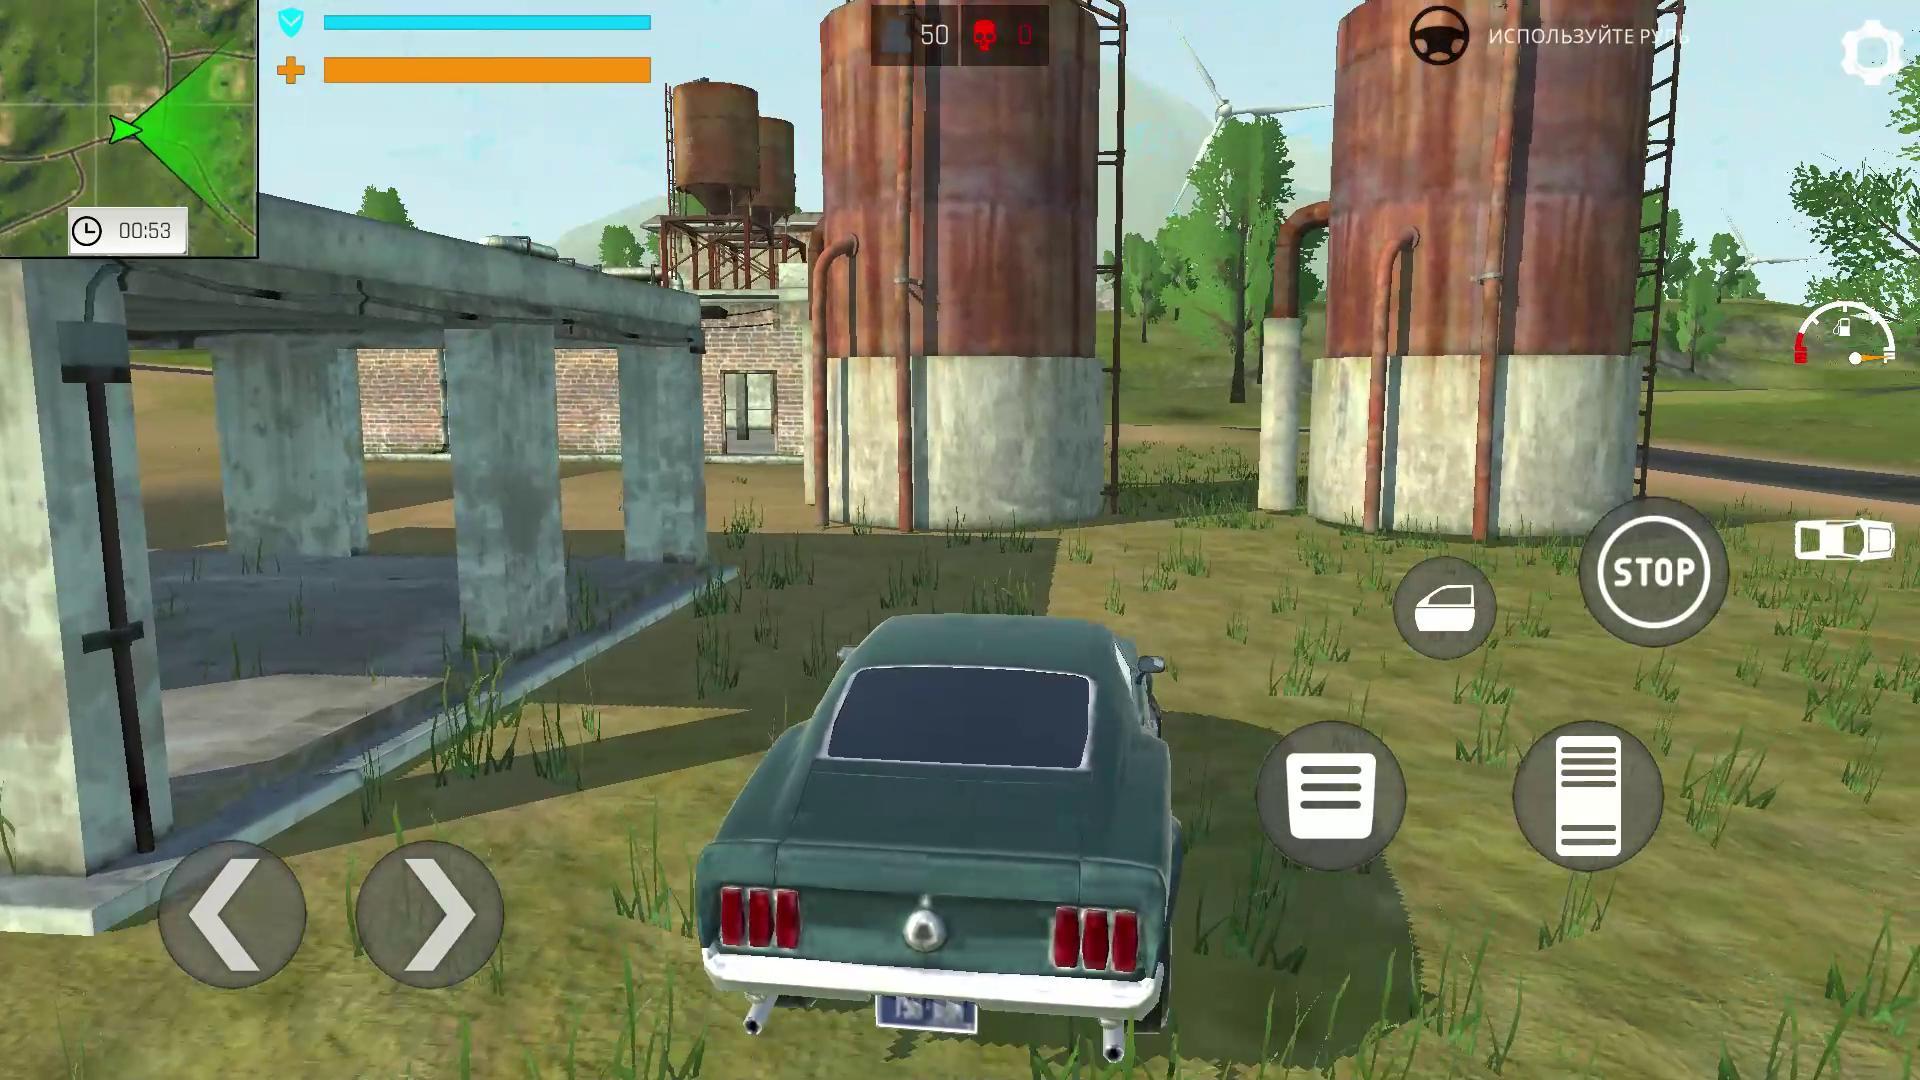 Modern War Game: New State & Battle Royale 游戏截图4